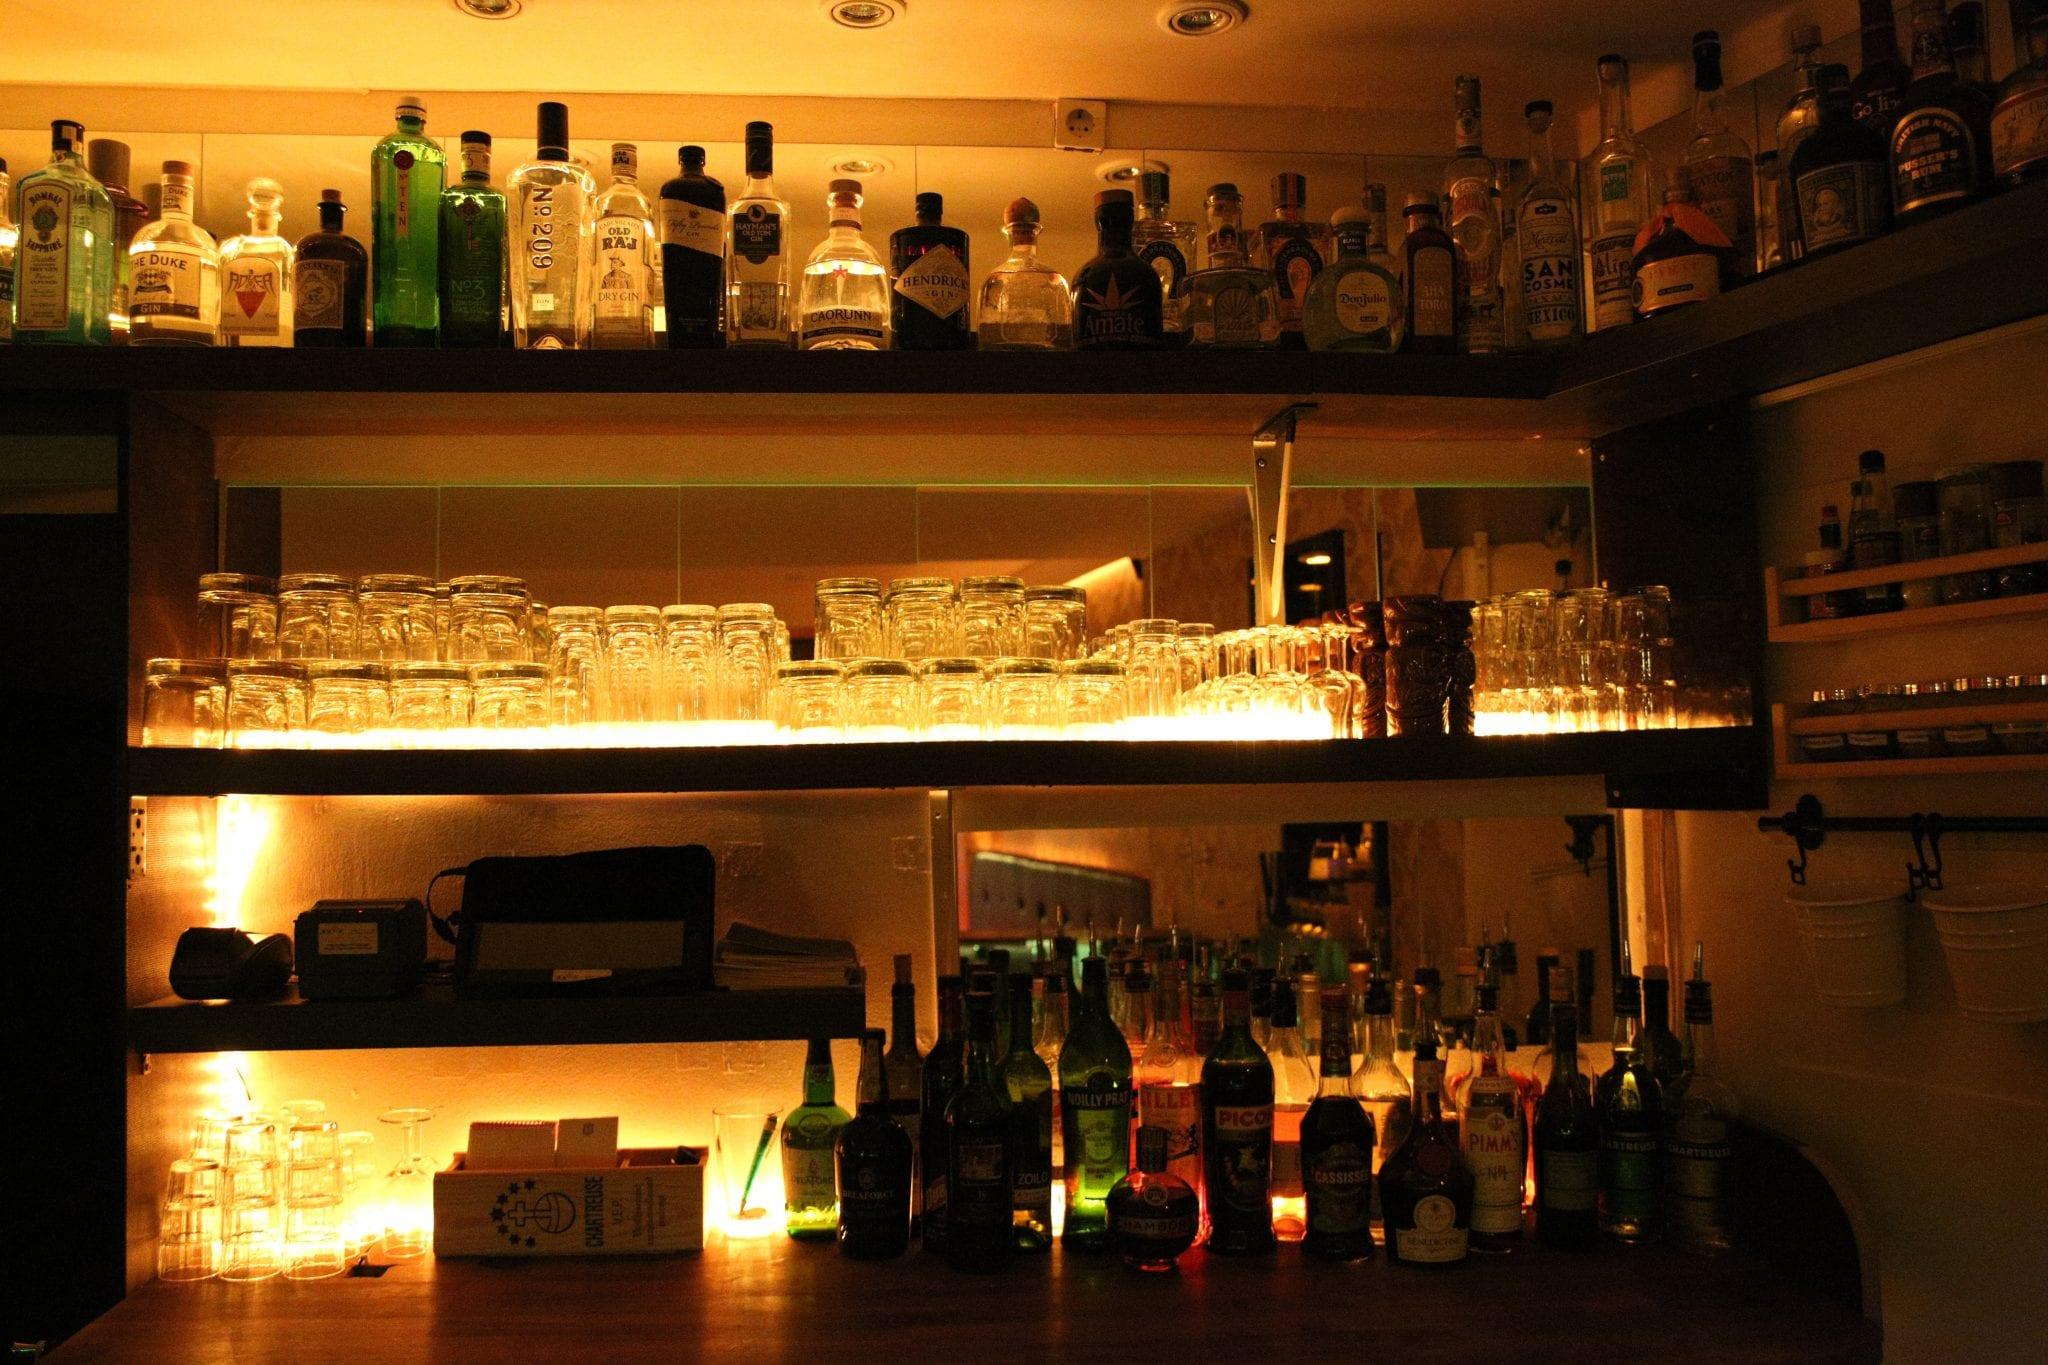 Die Vintage Bar Nrnberg Kleinod in der Altstadt  Mixology